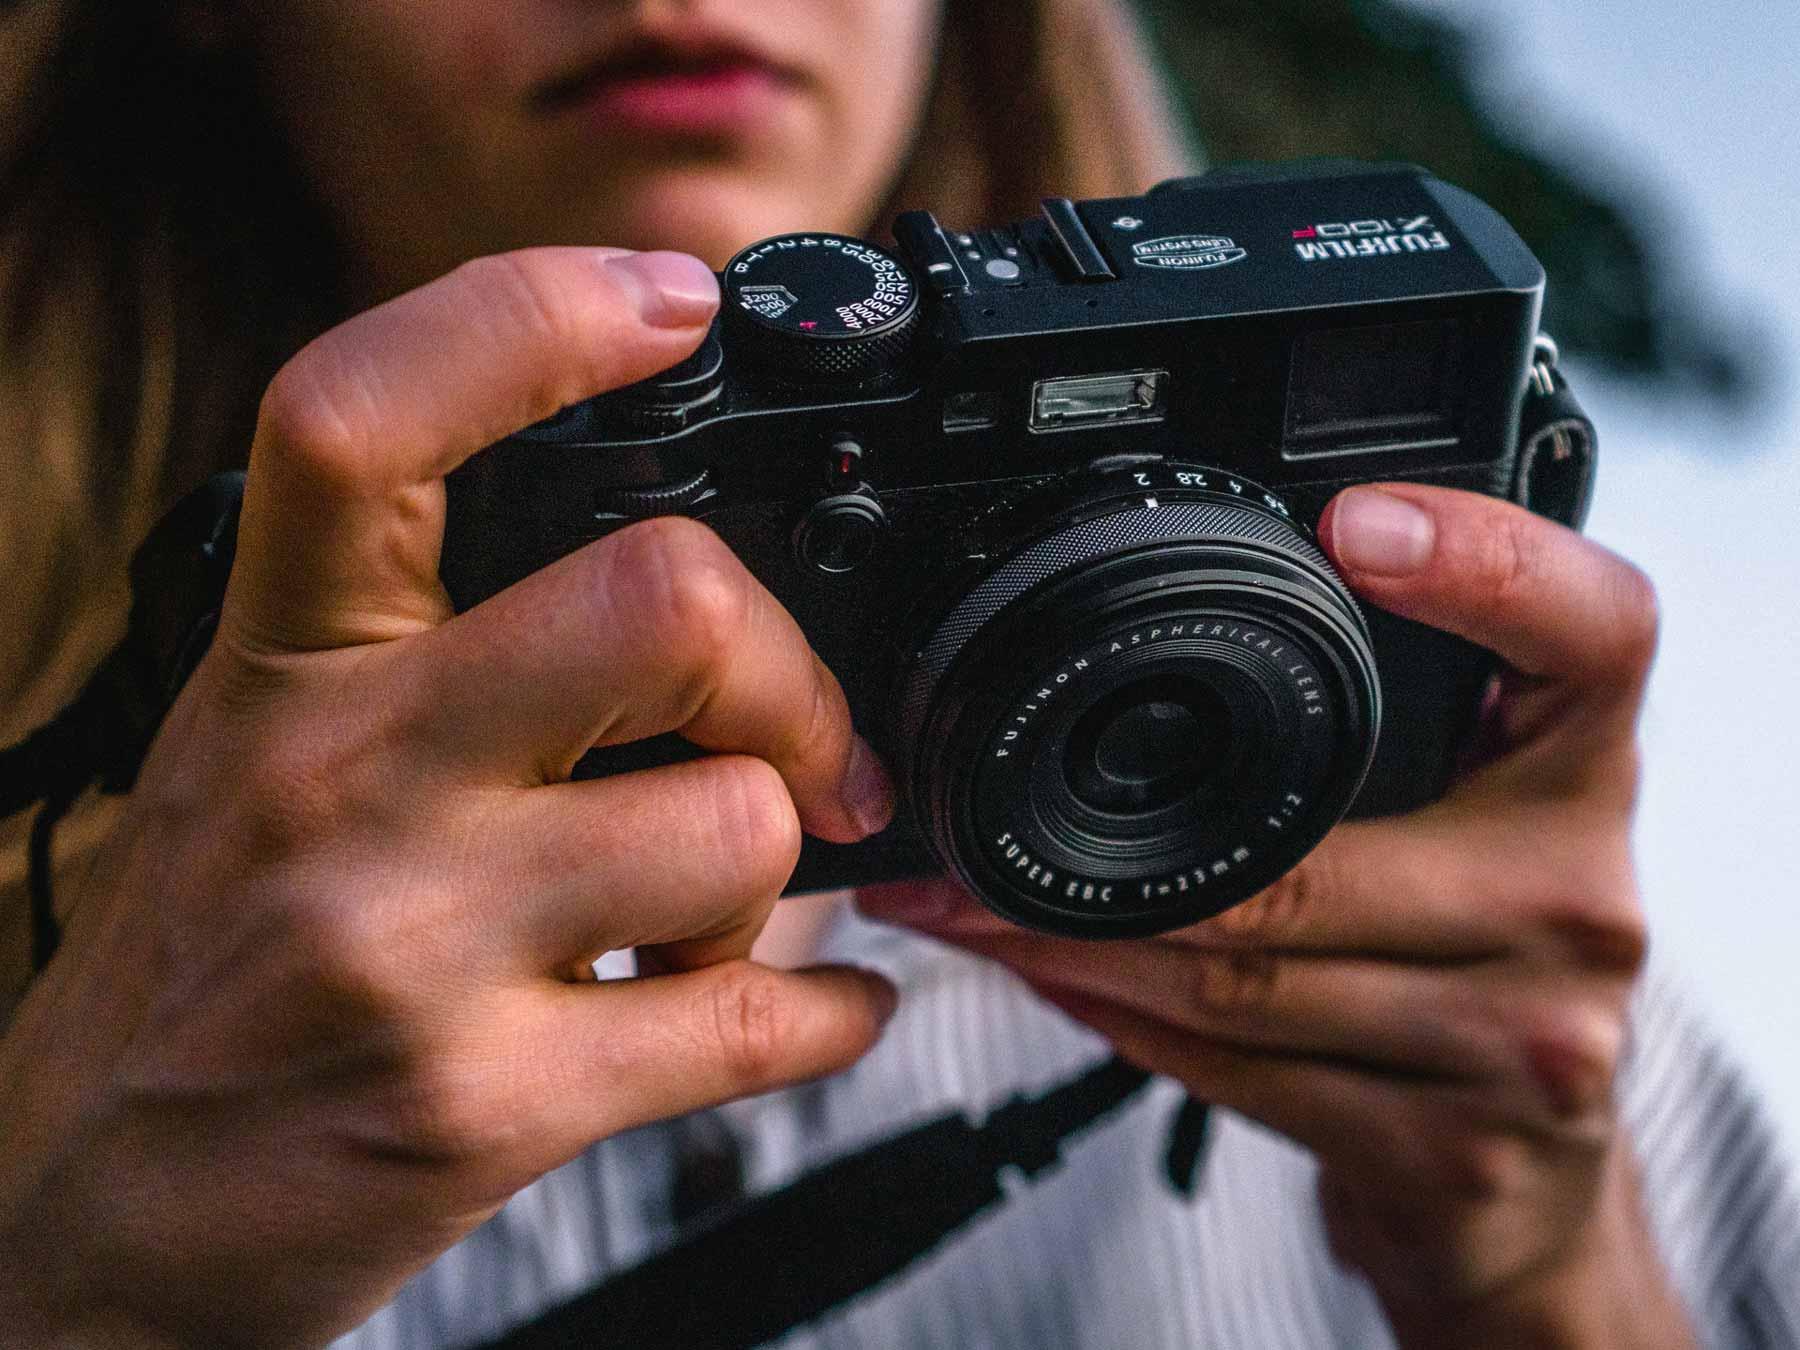 90 Fujifilm Hashtags for the Fujifilm Photographer